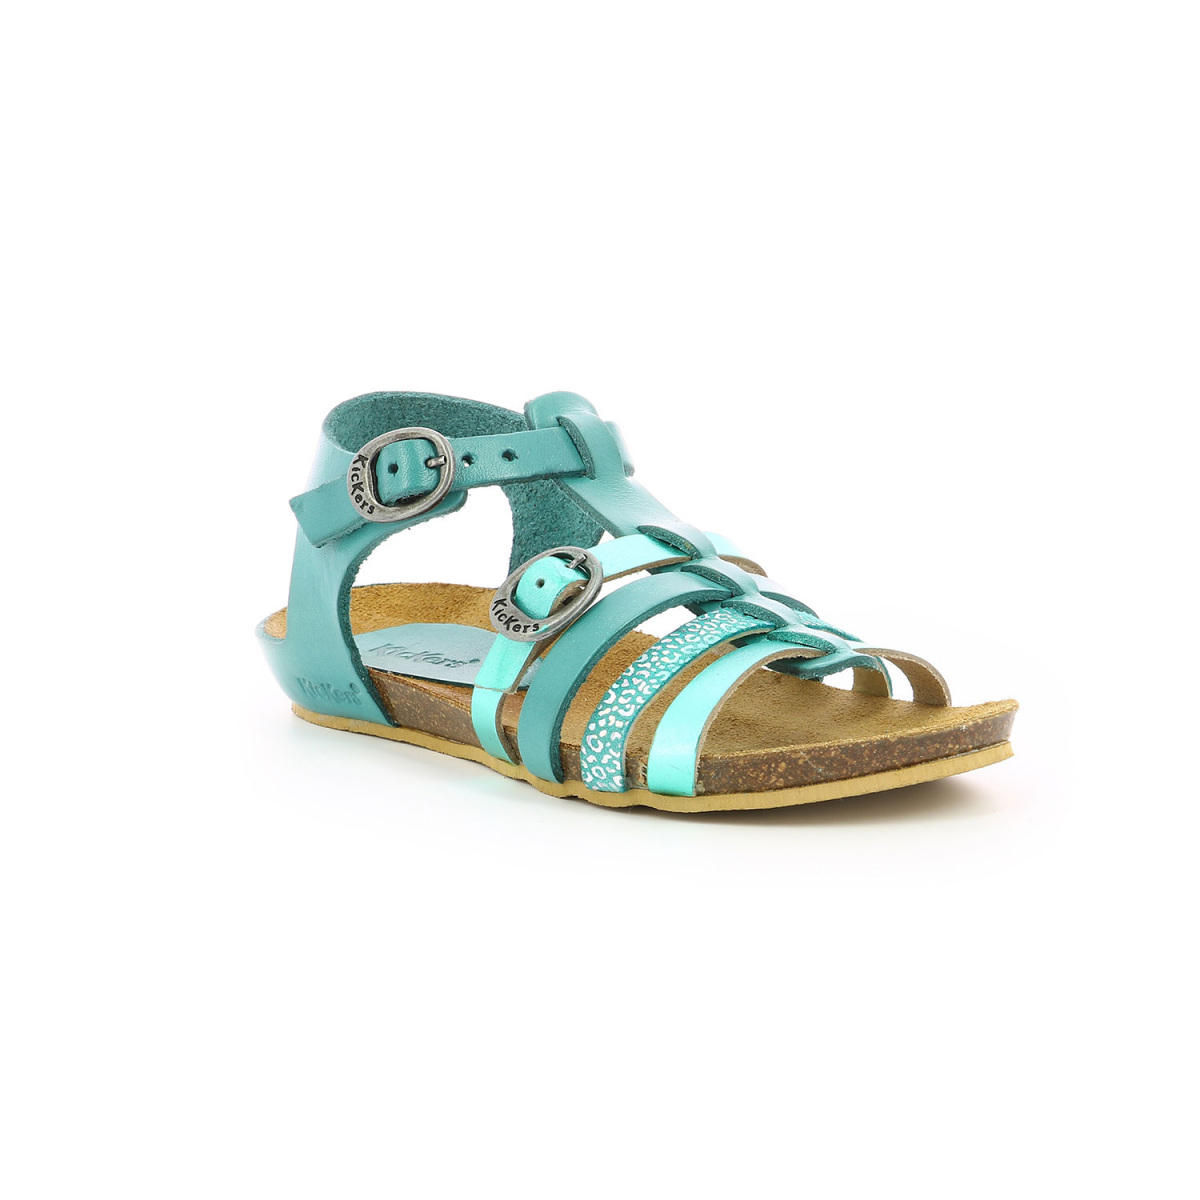 Kid's shoes BOBBAN METALLISED TURQUOISE Kickers